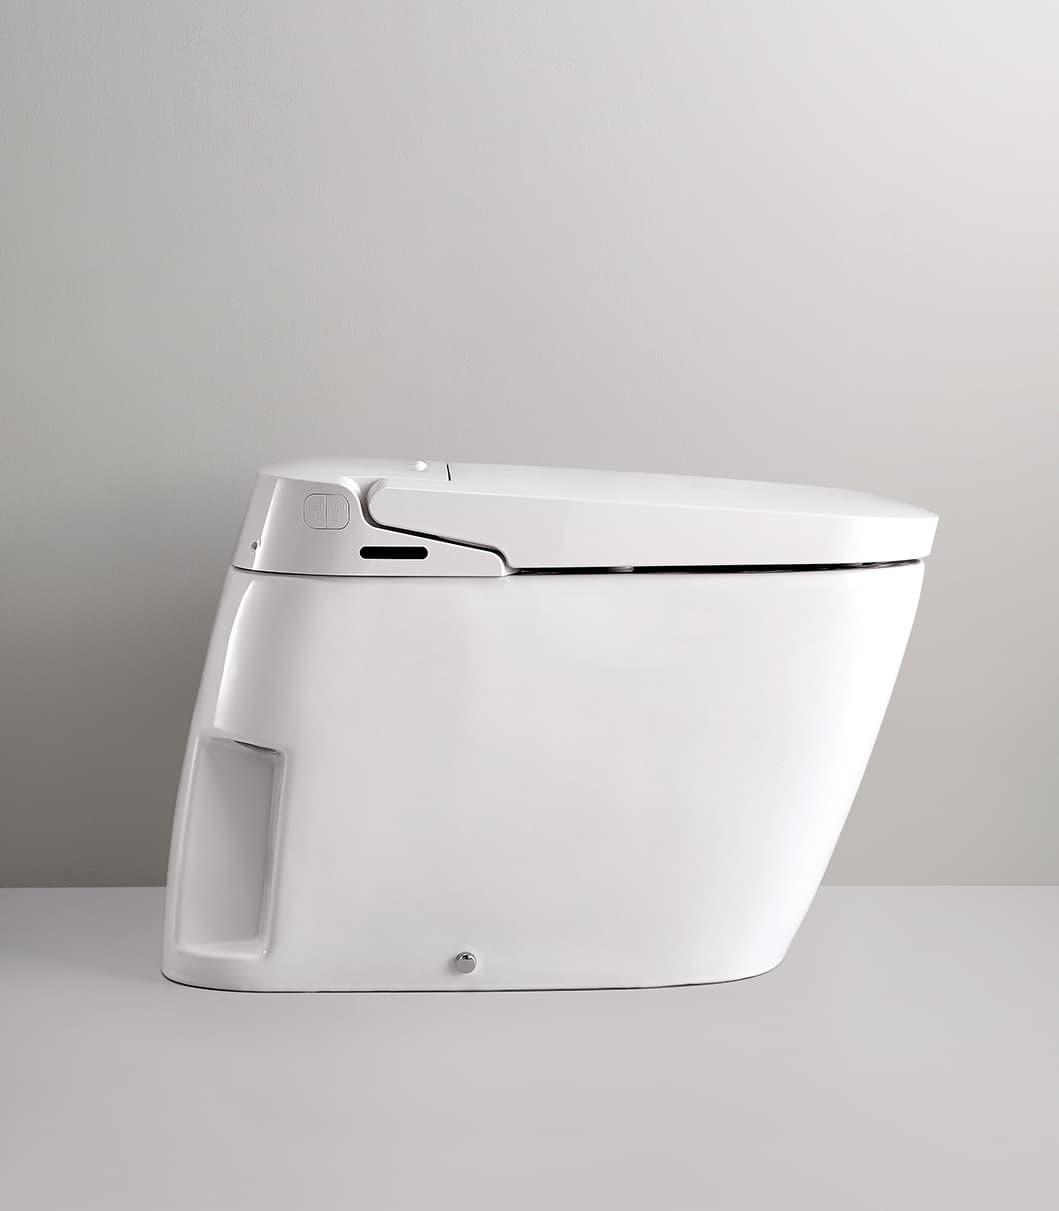 Bidet Integrated Toilet Smartlet 8000 Tradekorea